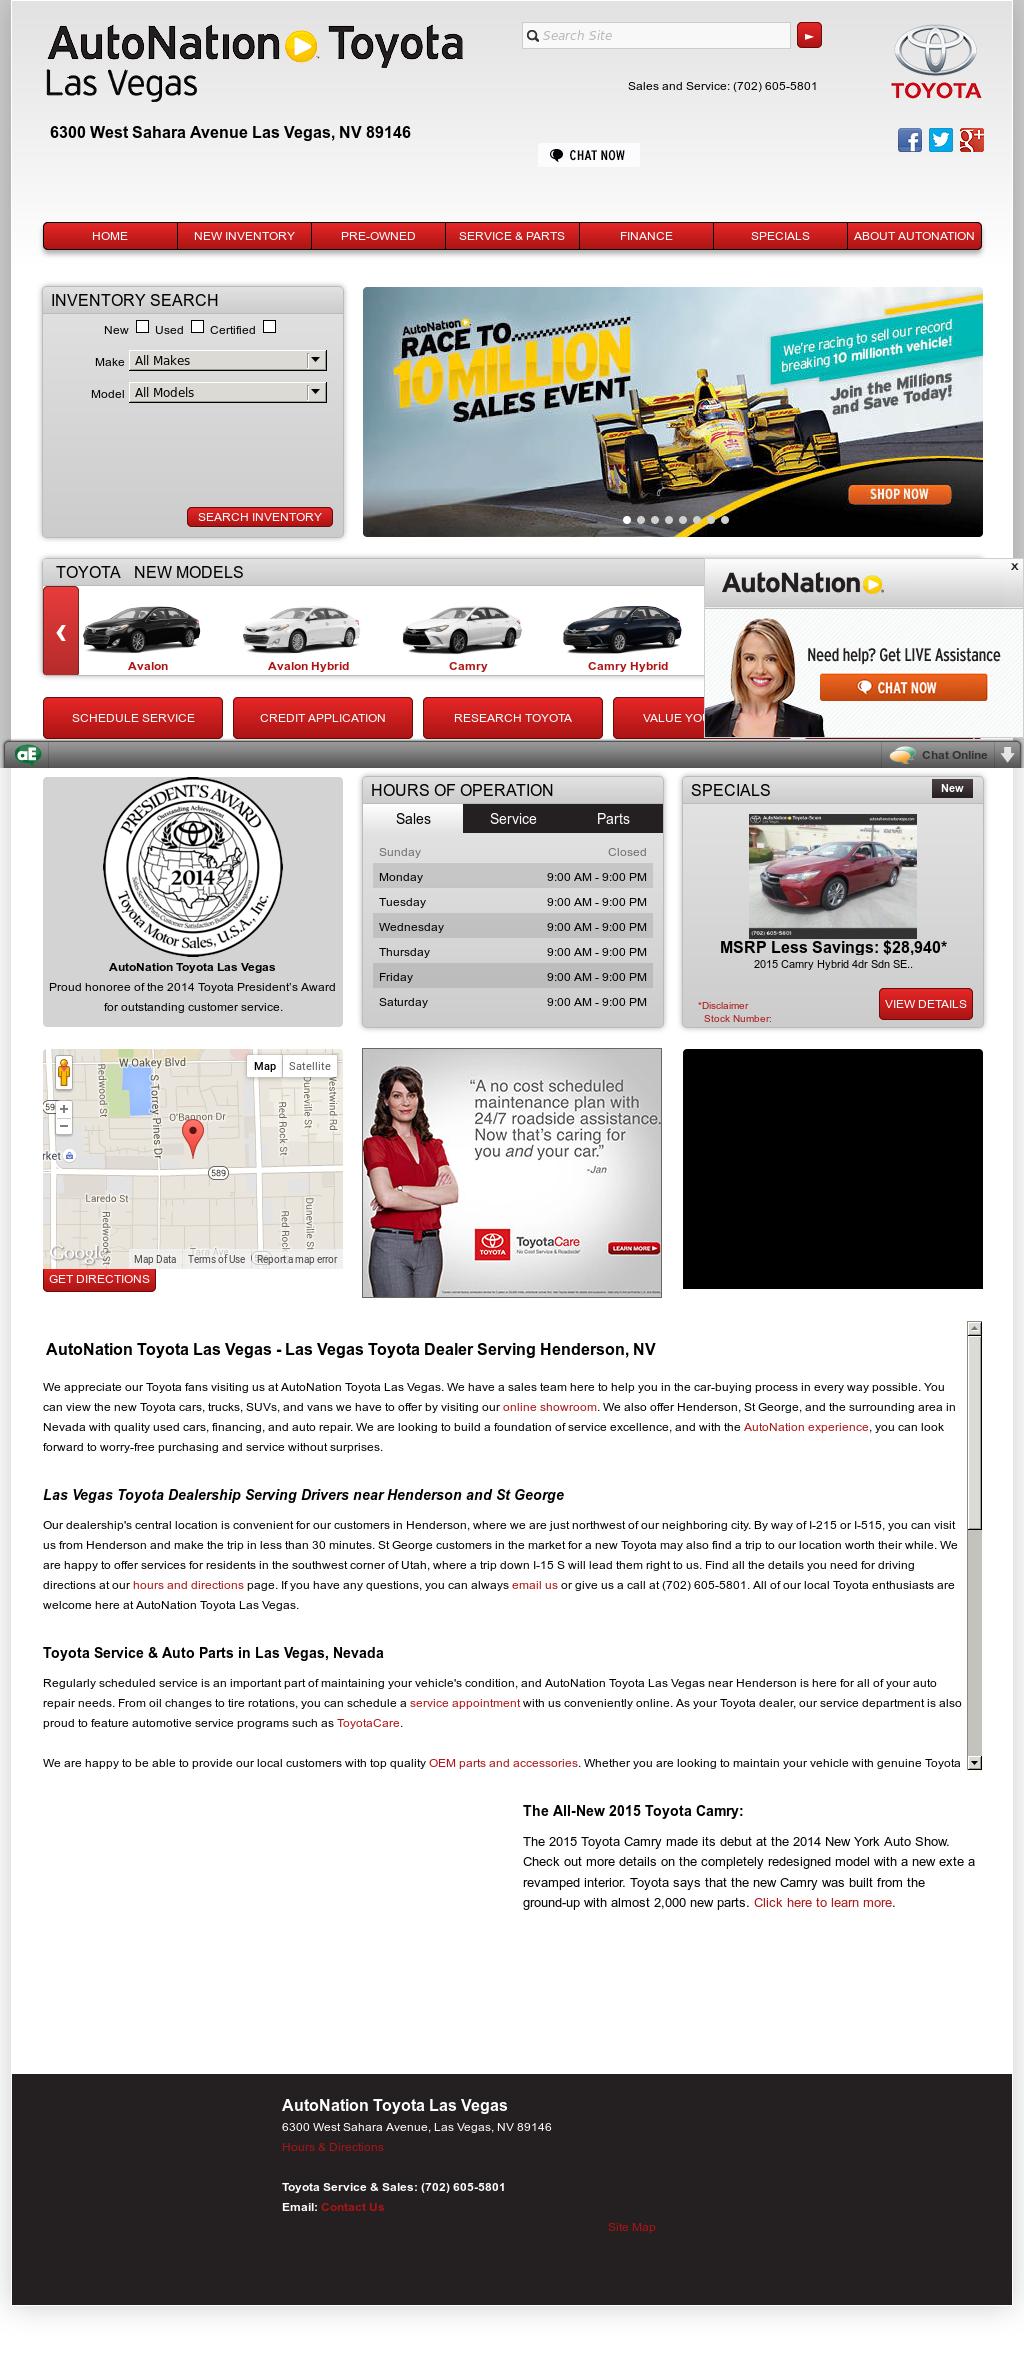 Superb Autonation Toyota Scion Las Vegas Competitors, Revenue And Employees    Owler Company Profile